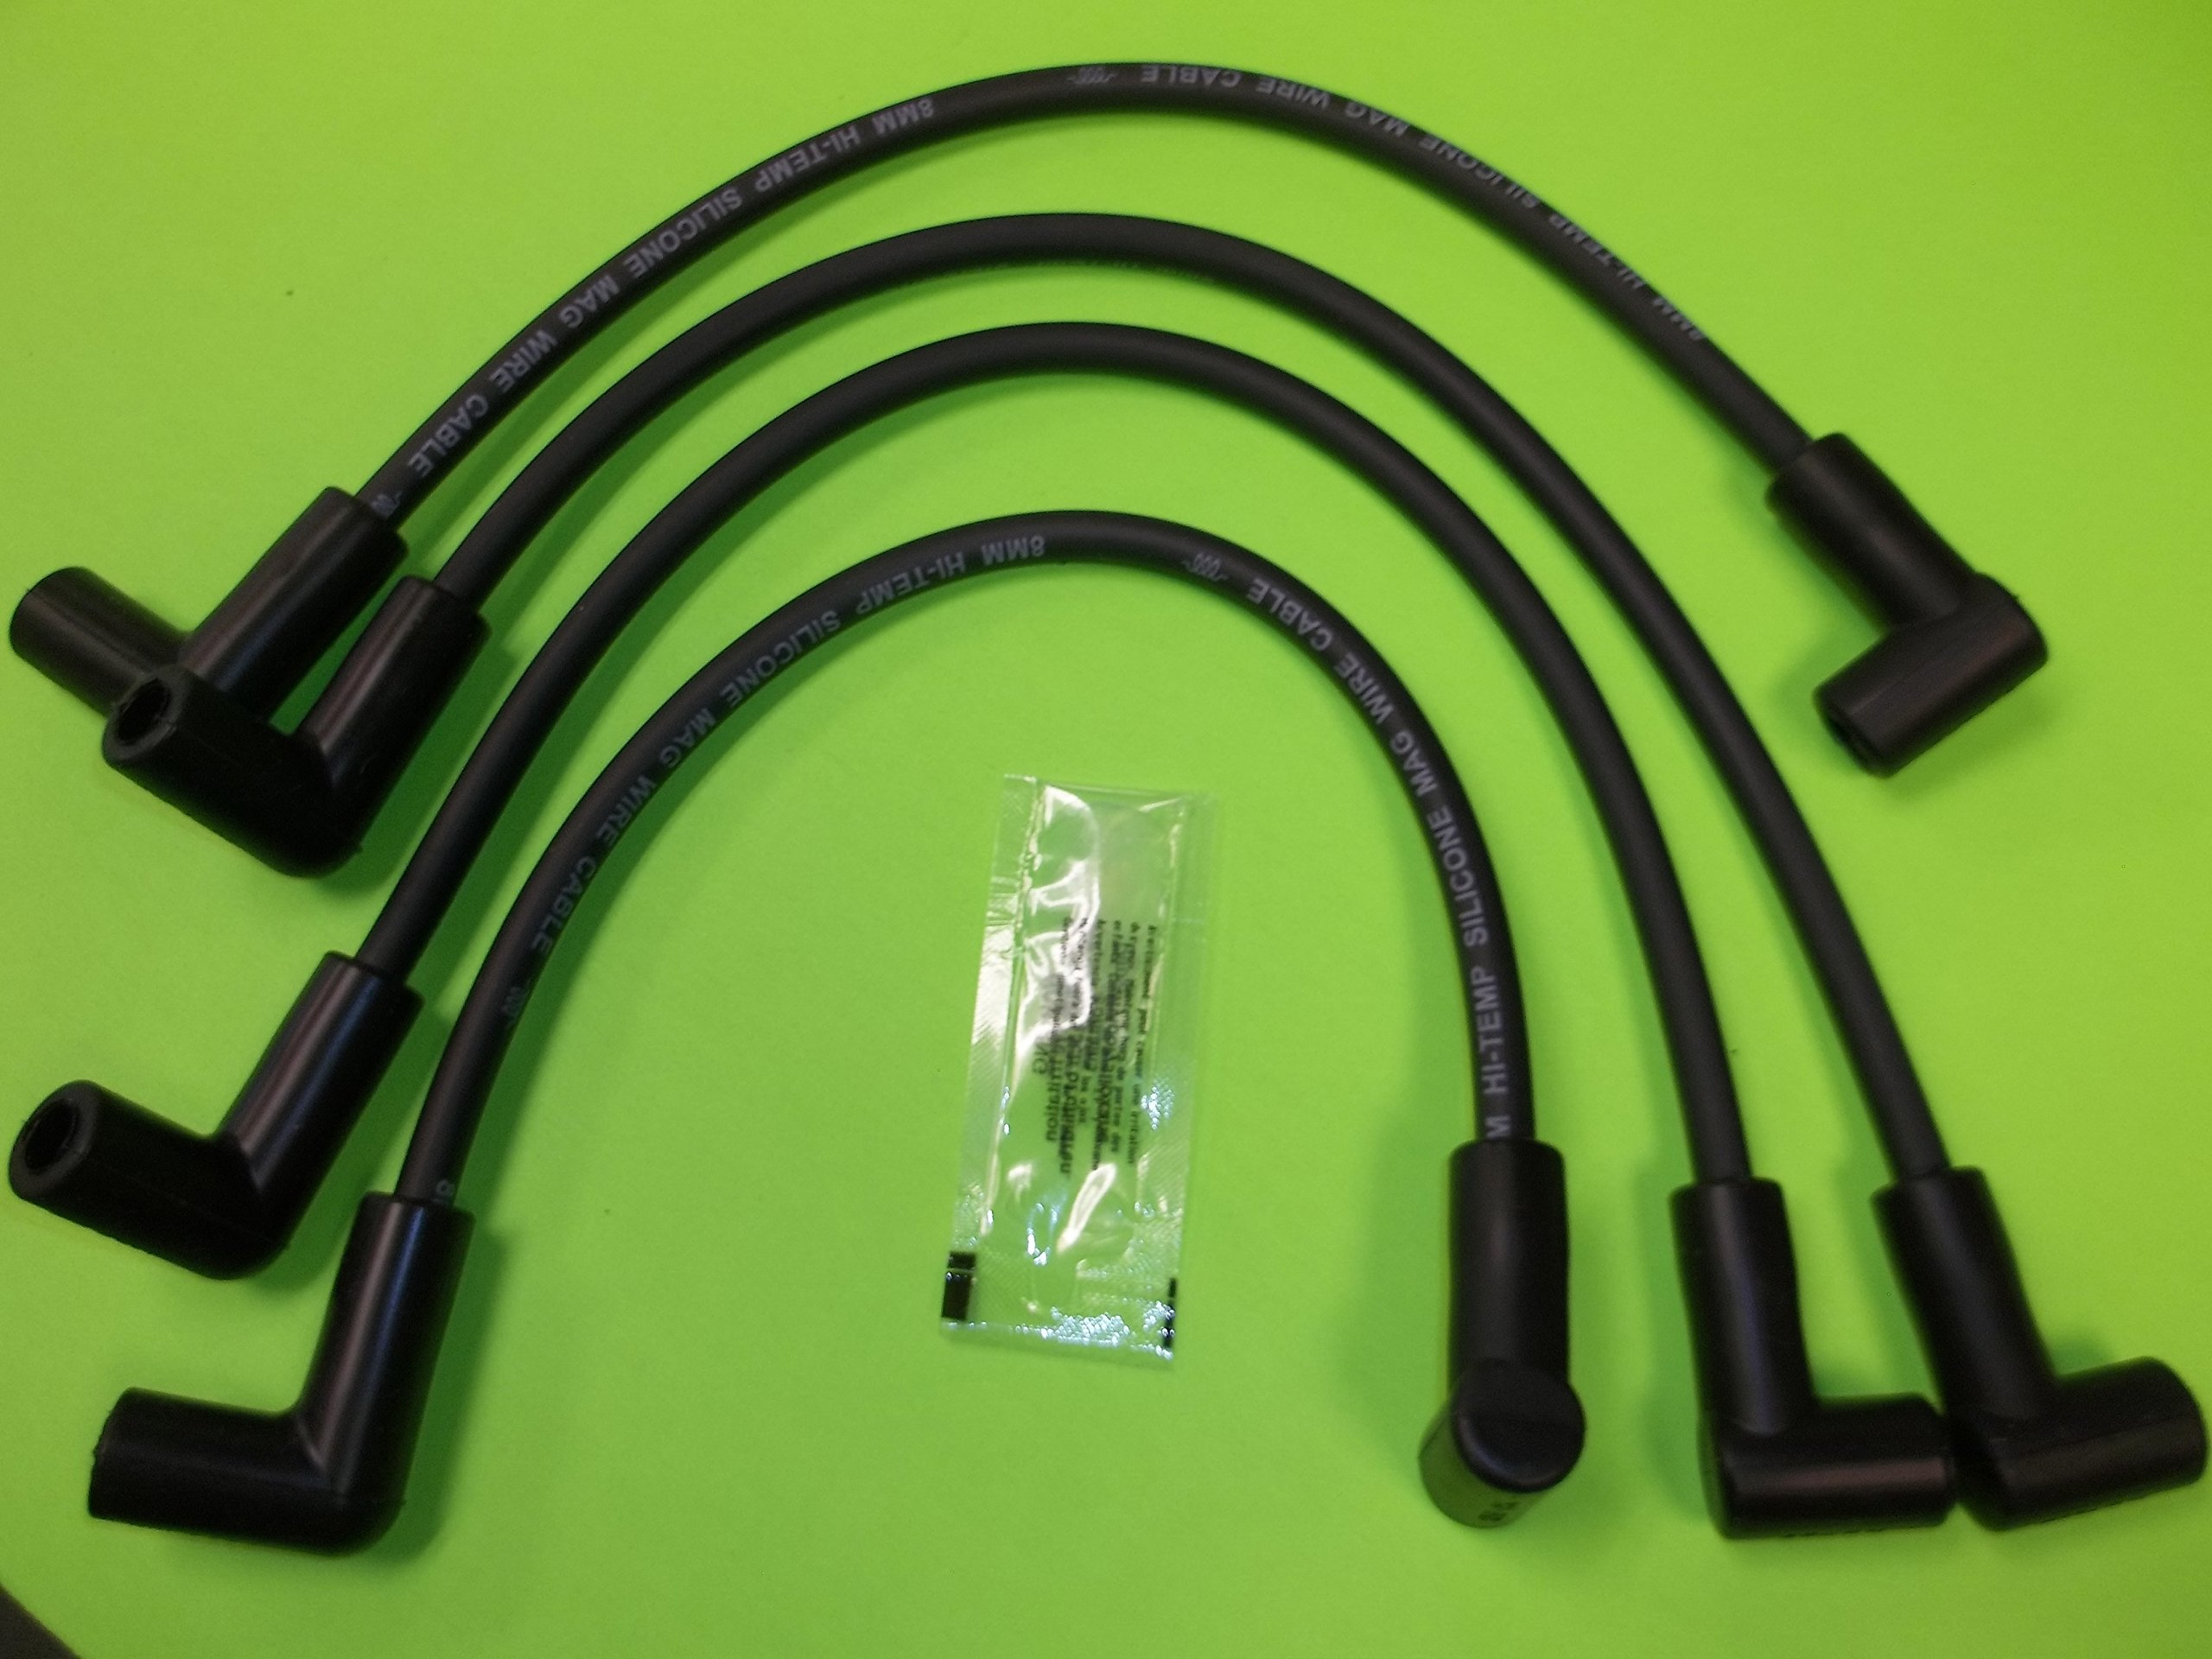 Ignition Spark Plug Wire Set 60 deg 584919 V4 Johnson Evinrude 90 100 105 115